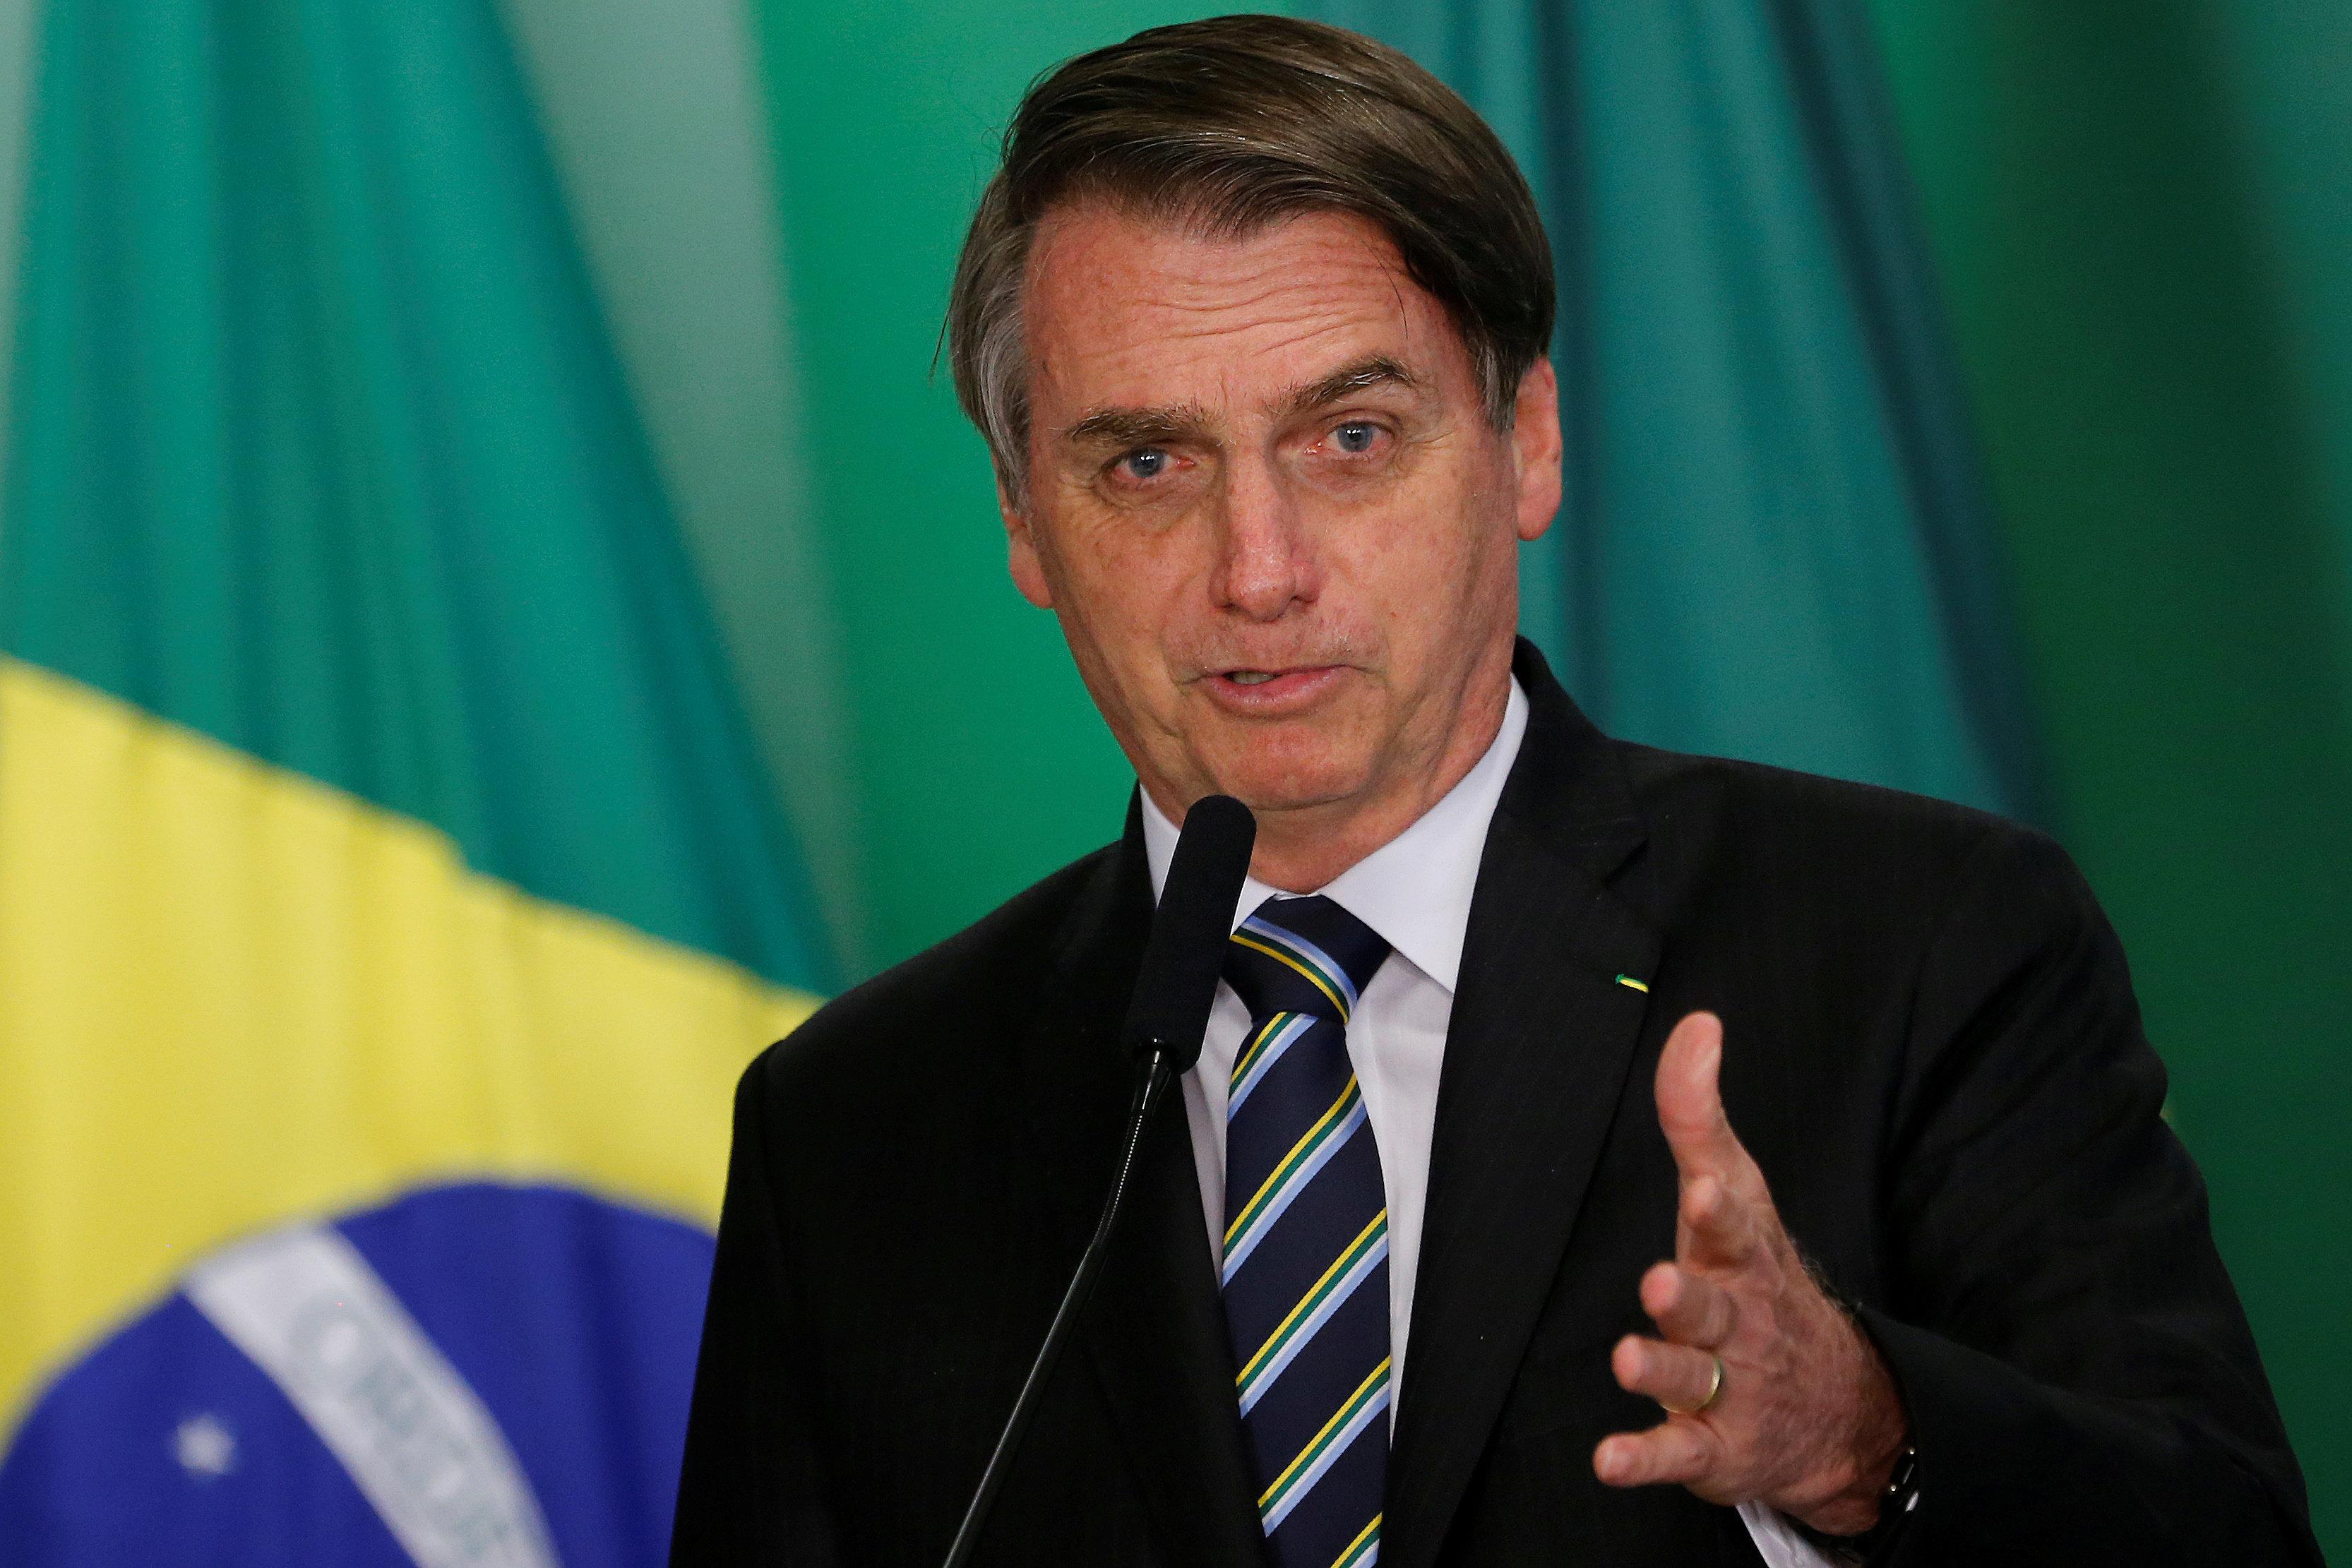 Natural History Museum Won't Host Event Honoring Brazil President Jair Bolsonaro